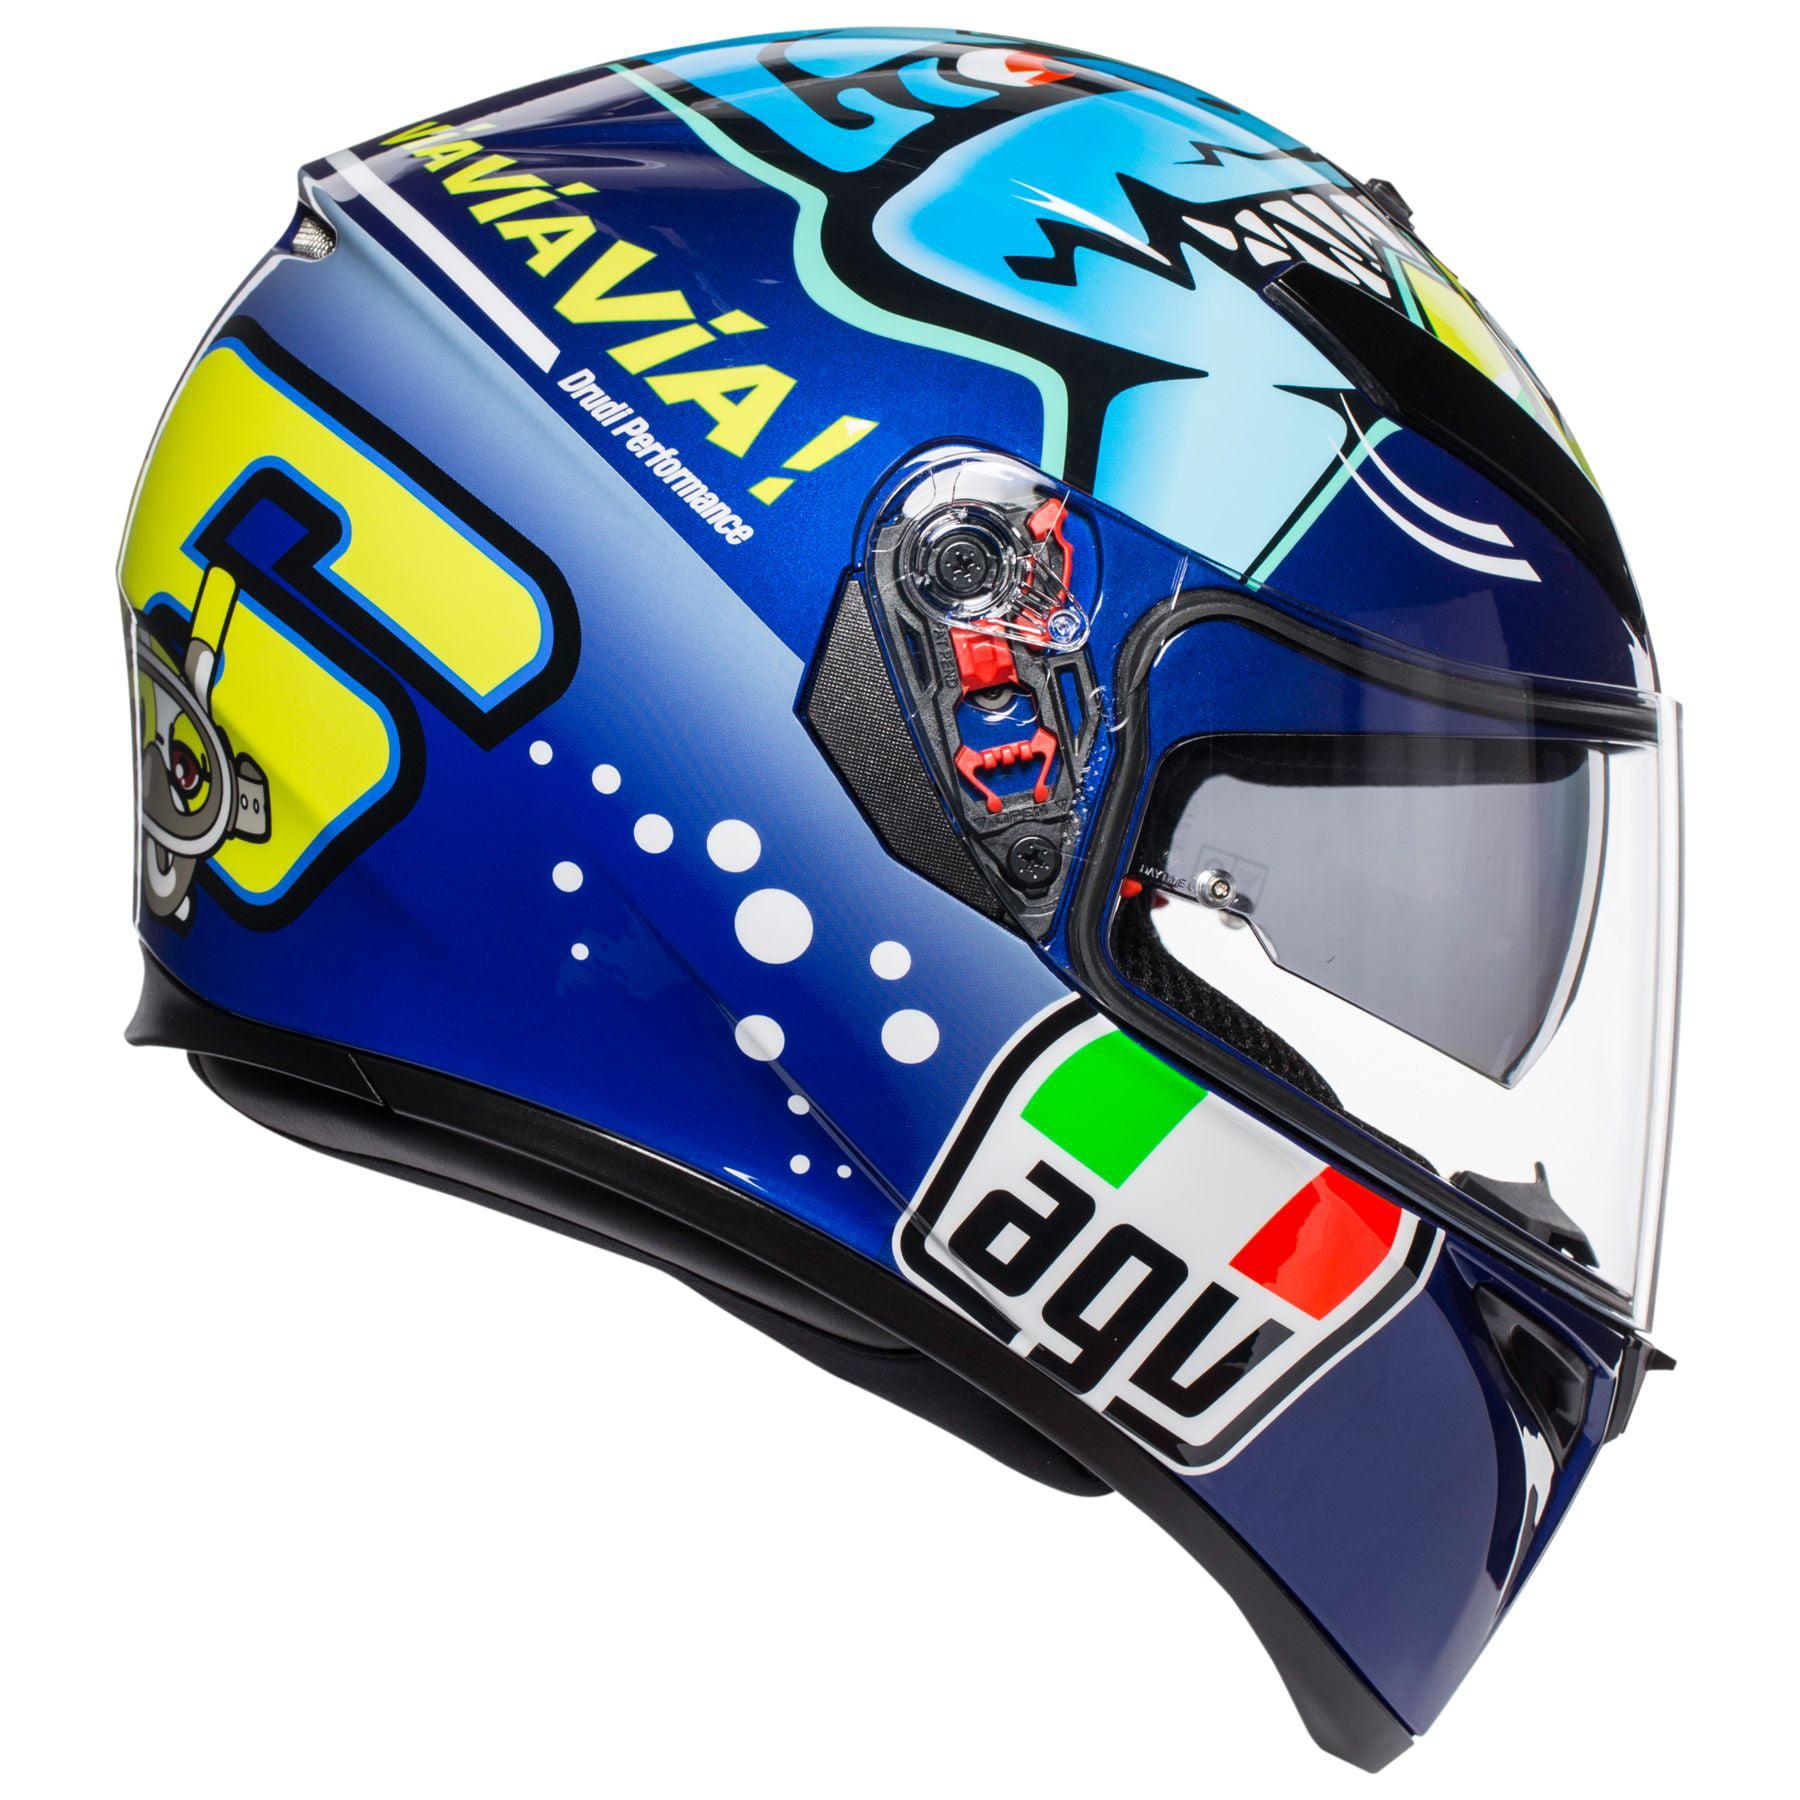 Agv K3 Sv Rossi Misano 15 Motorcycle Helmet Blue Black Walmart Com Walmart Com